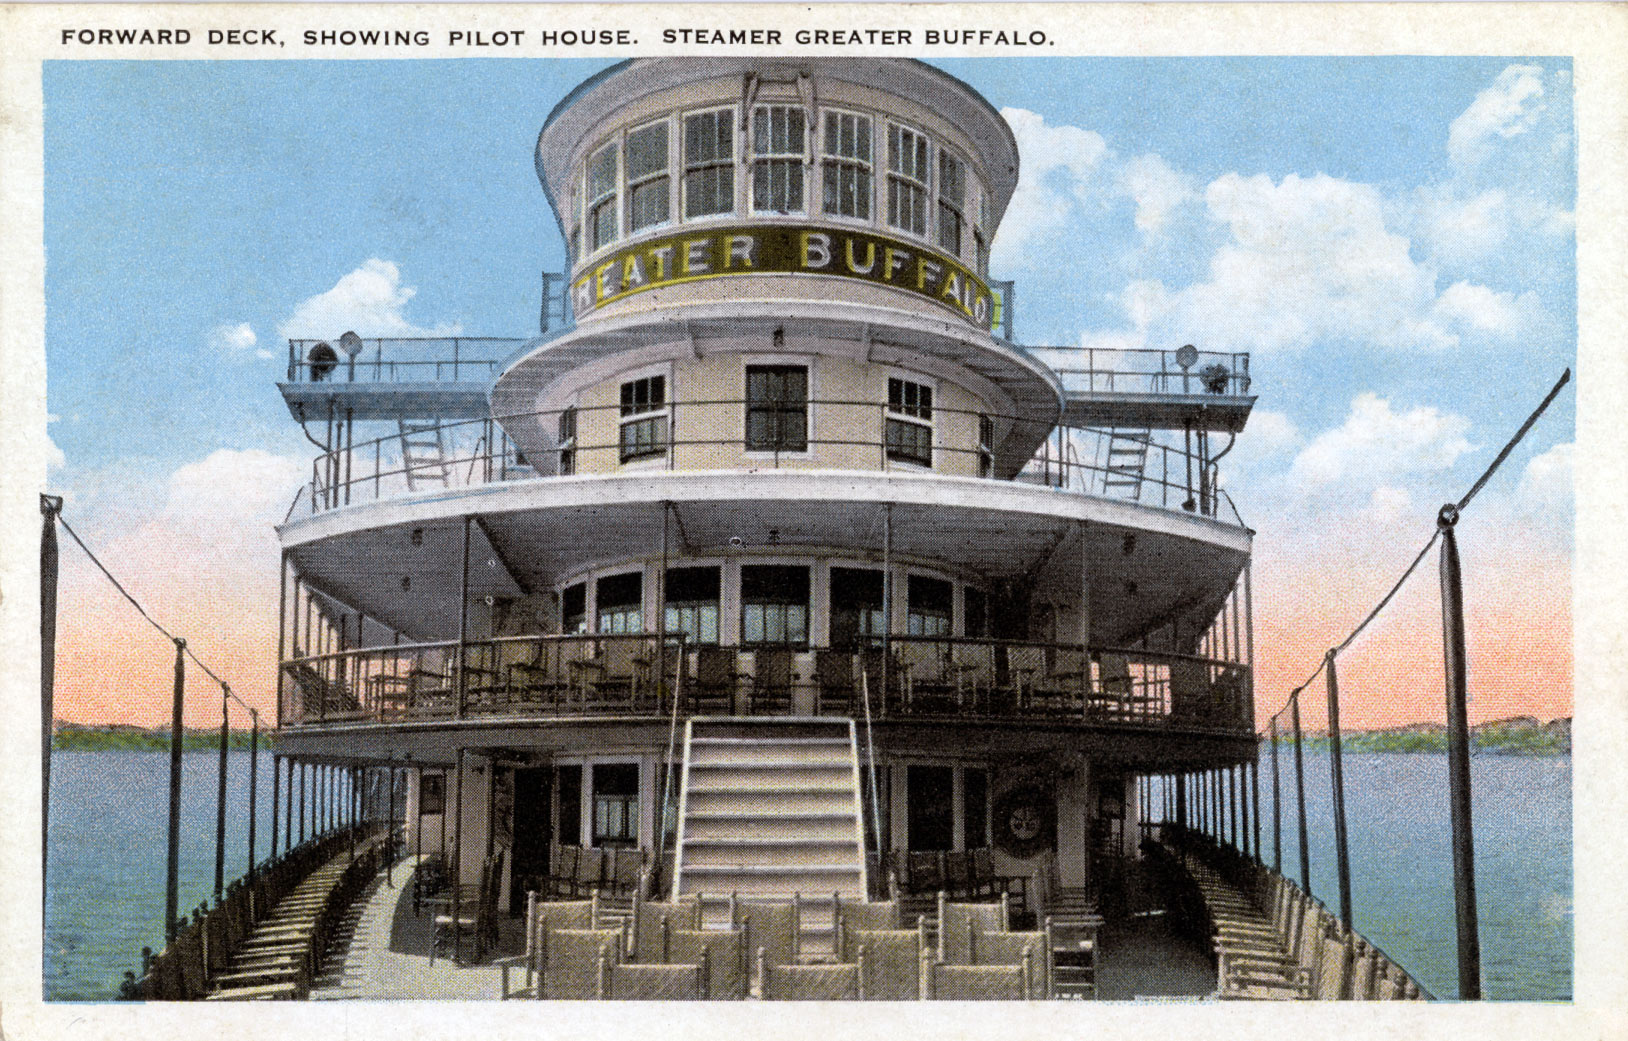 Forward Deck, showing Pilot House. Steamer Greater Buffalo